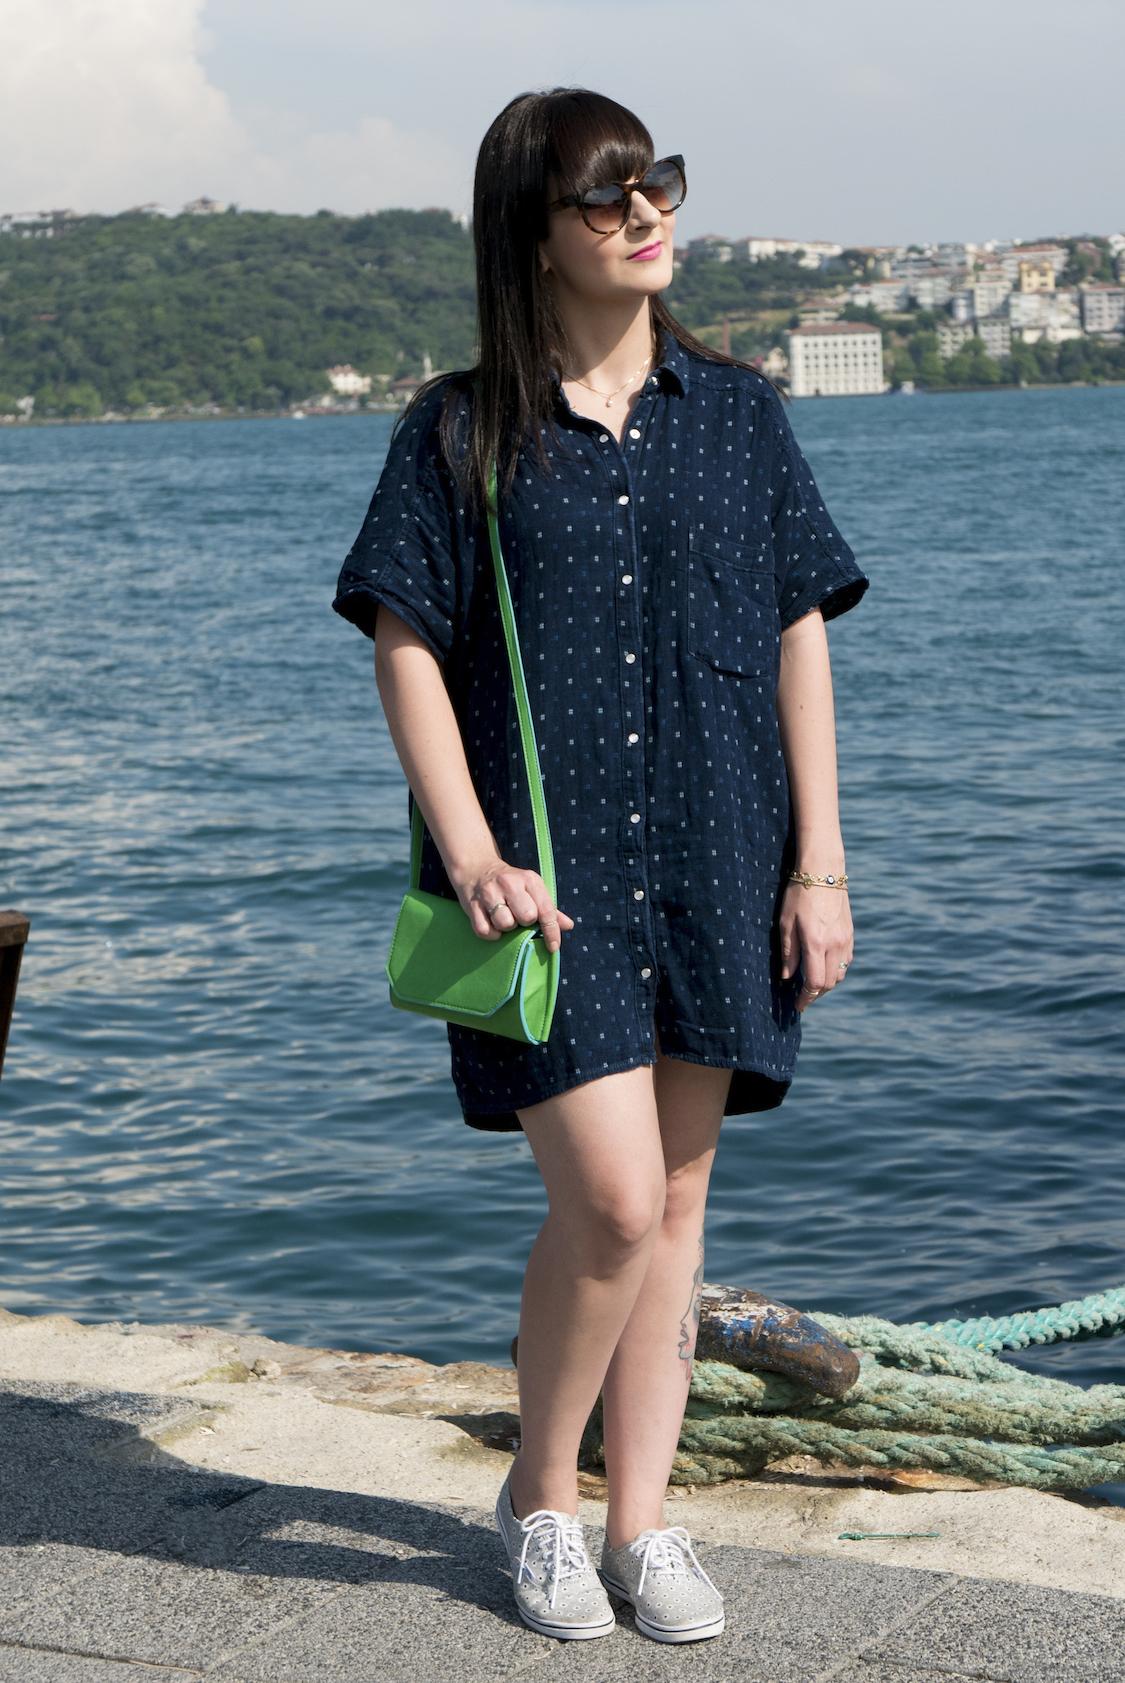 istambul-look-camisa-azul-bolinhas-danielle-noce-5